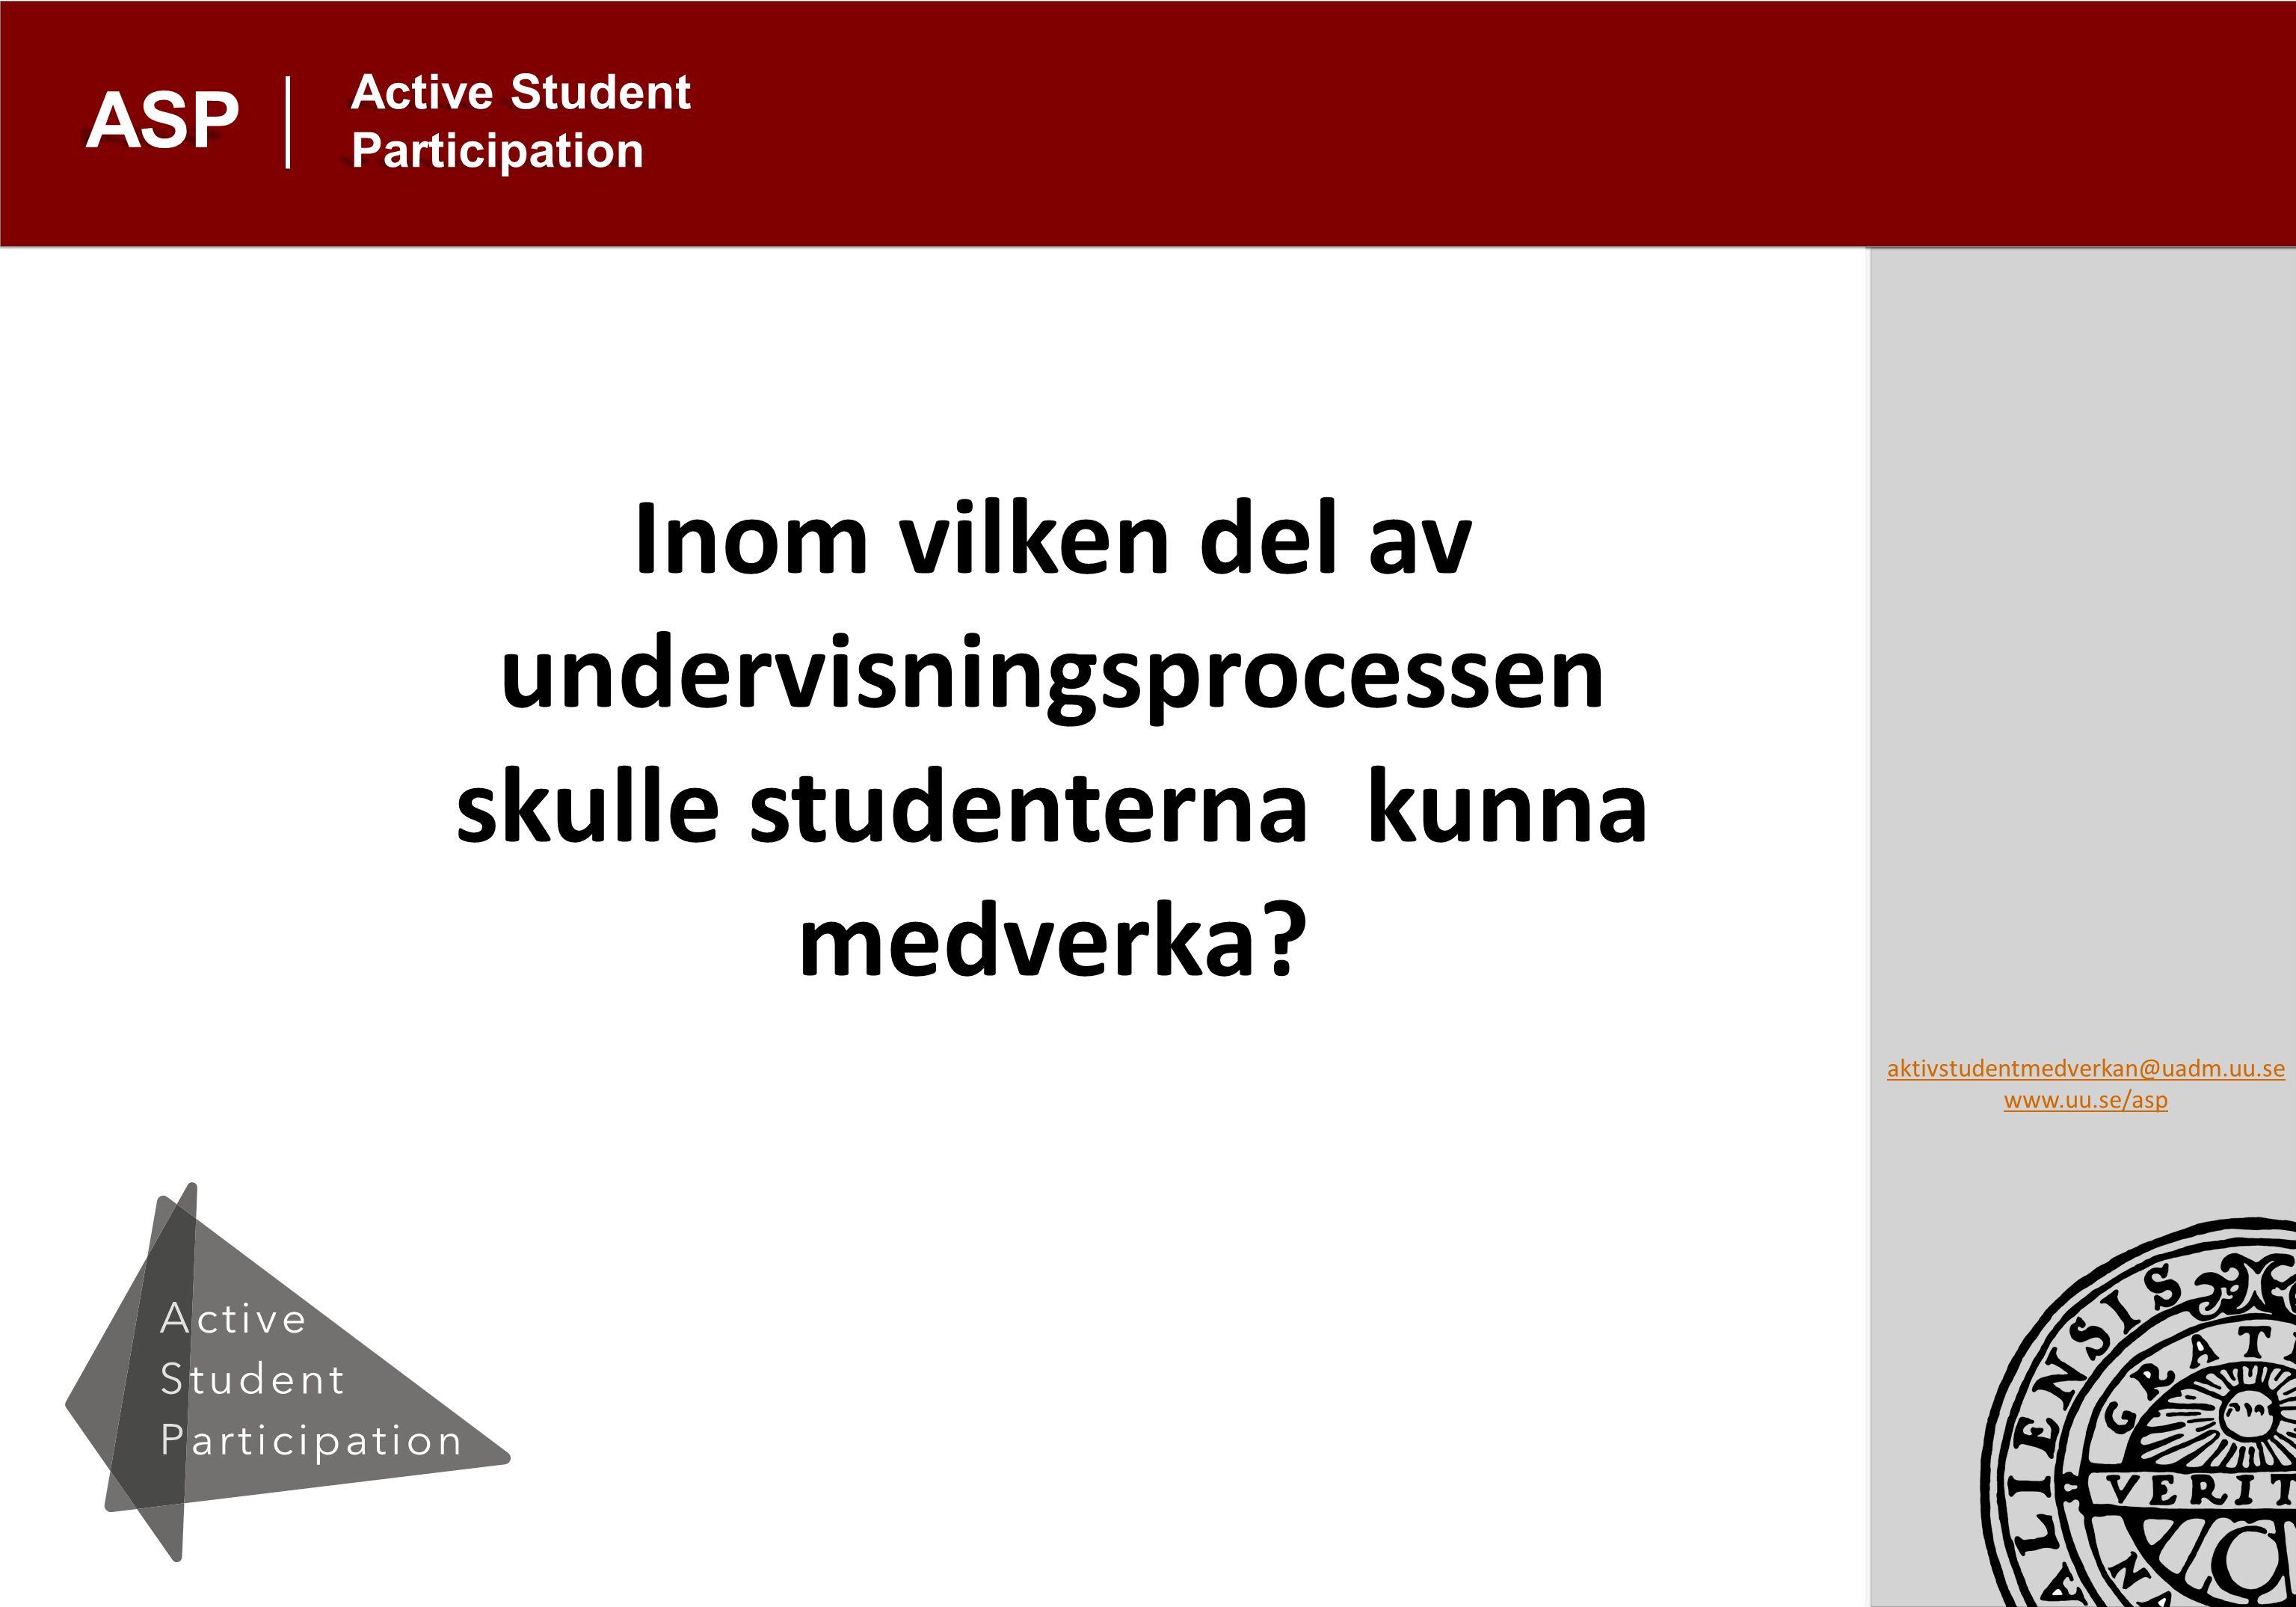 aktivstudentmedverkan@uadm.uu.se www.uu.se/asp Active Student Participation ASP Hitta stöd och inspiration Kontakta aktivstudentmedverkan@uadm.uu.se.